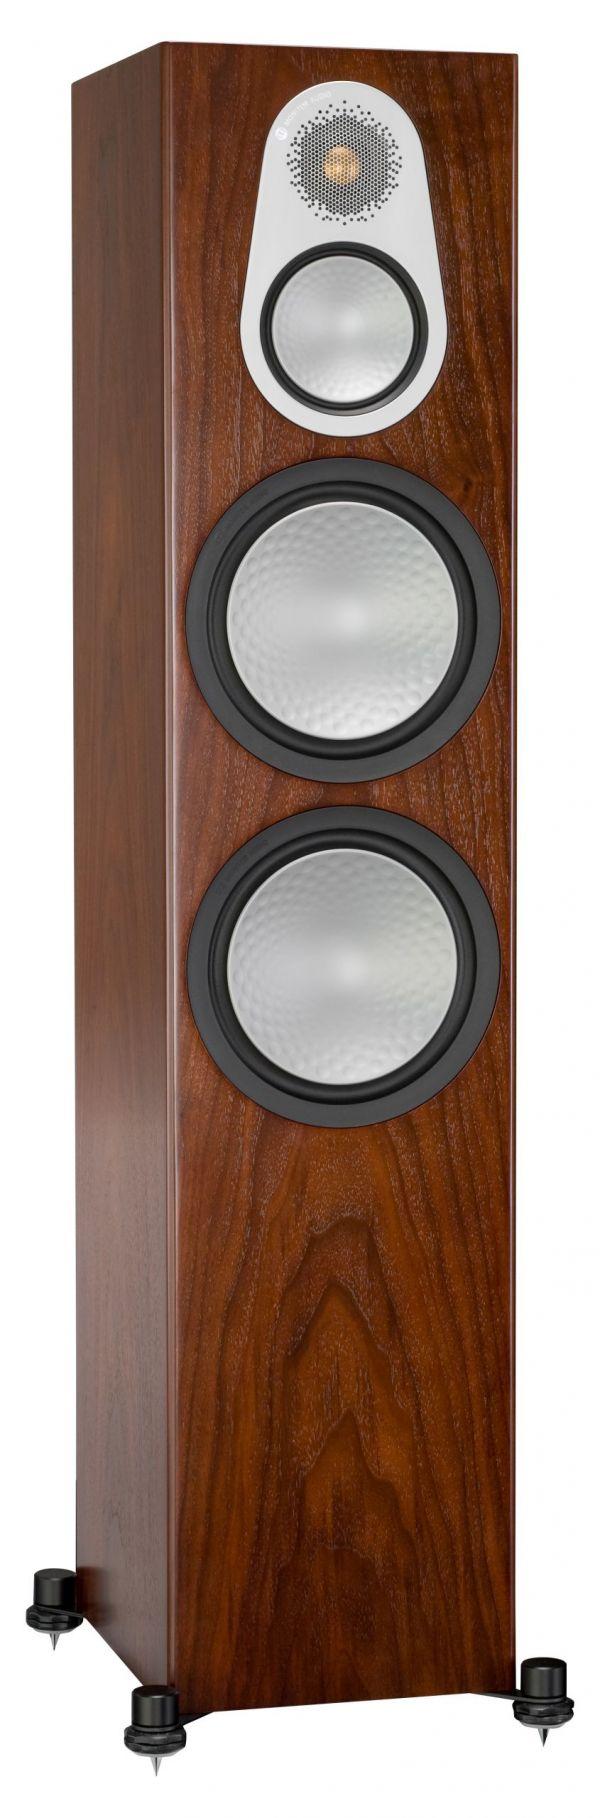 Monitor Audio Silver 500 Iso Walnut scaled